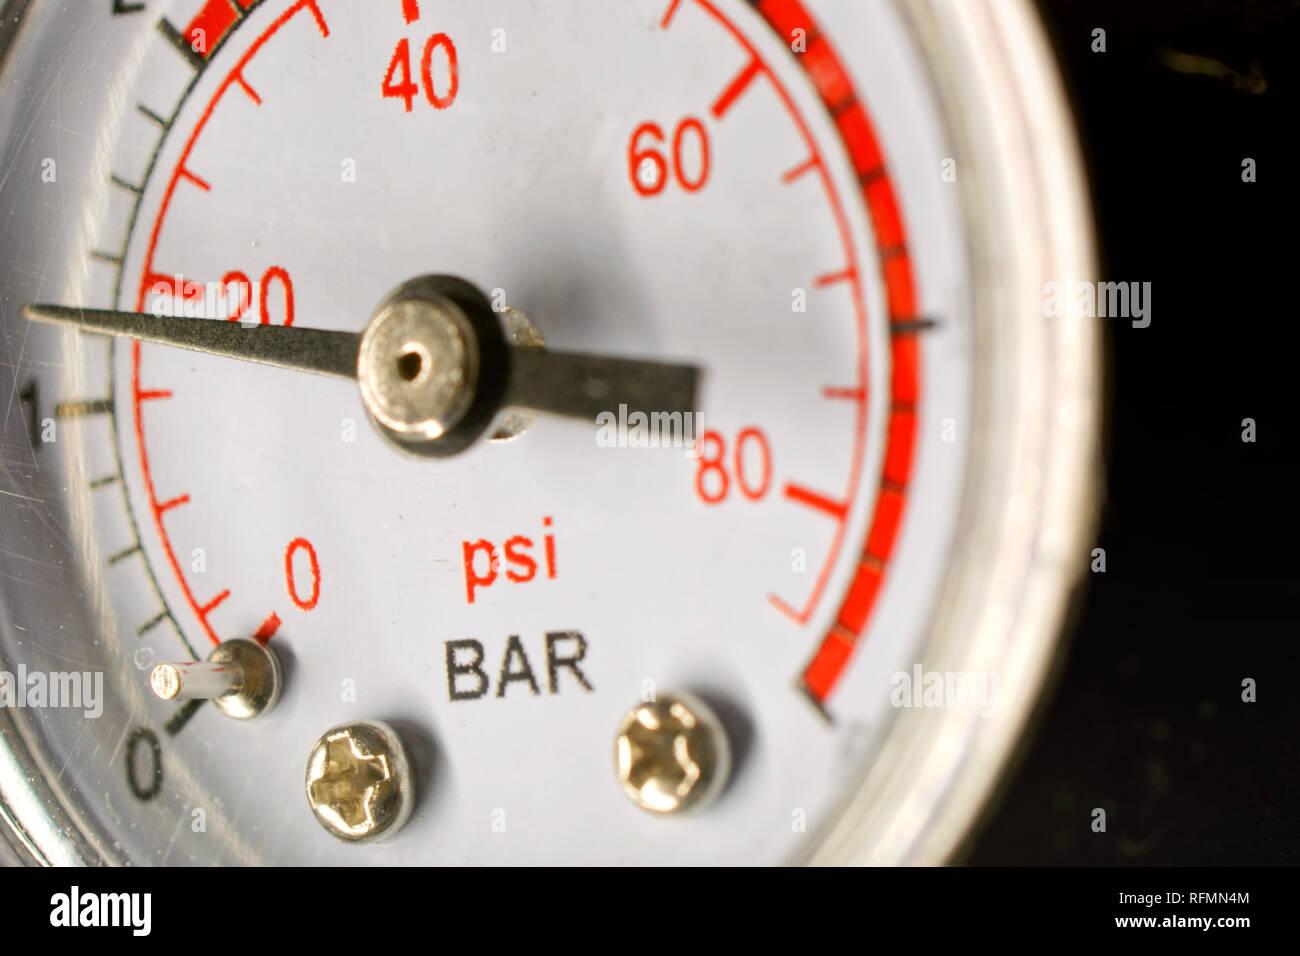 Pressure Gauge - Stock Image